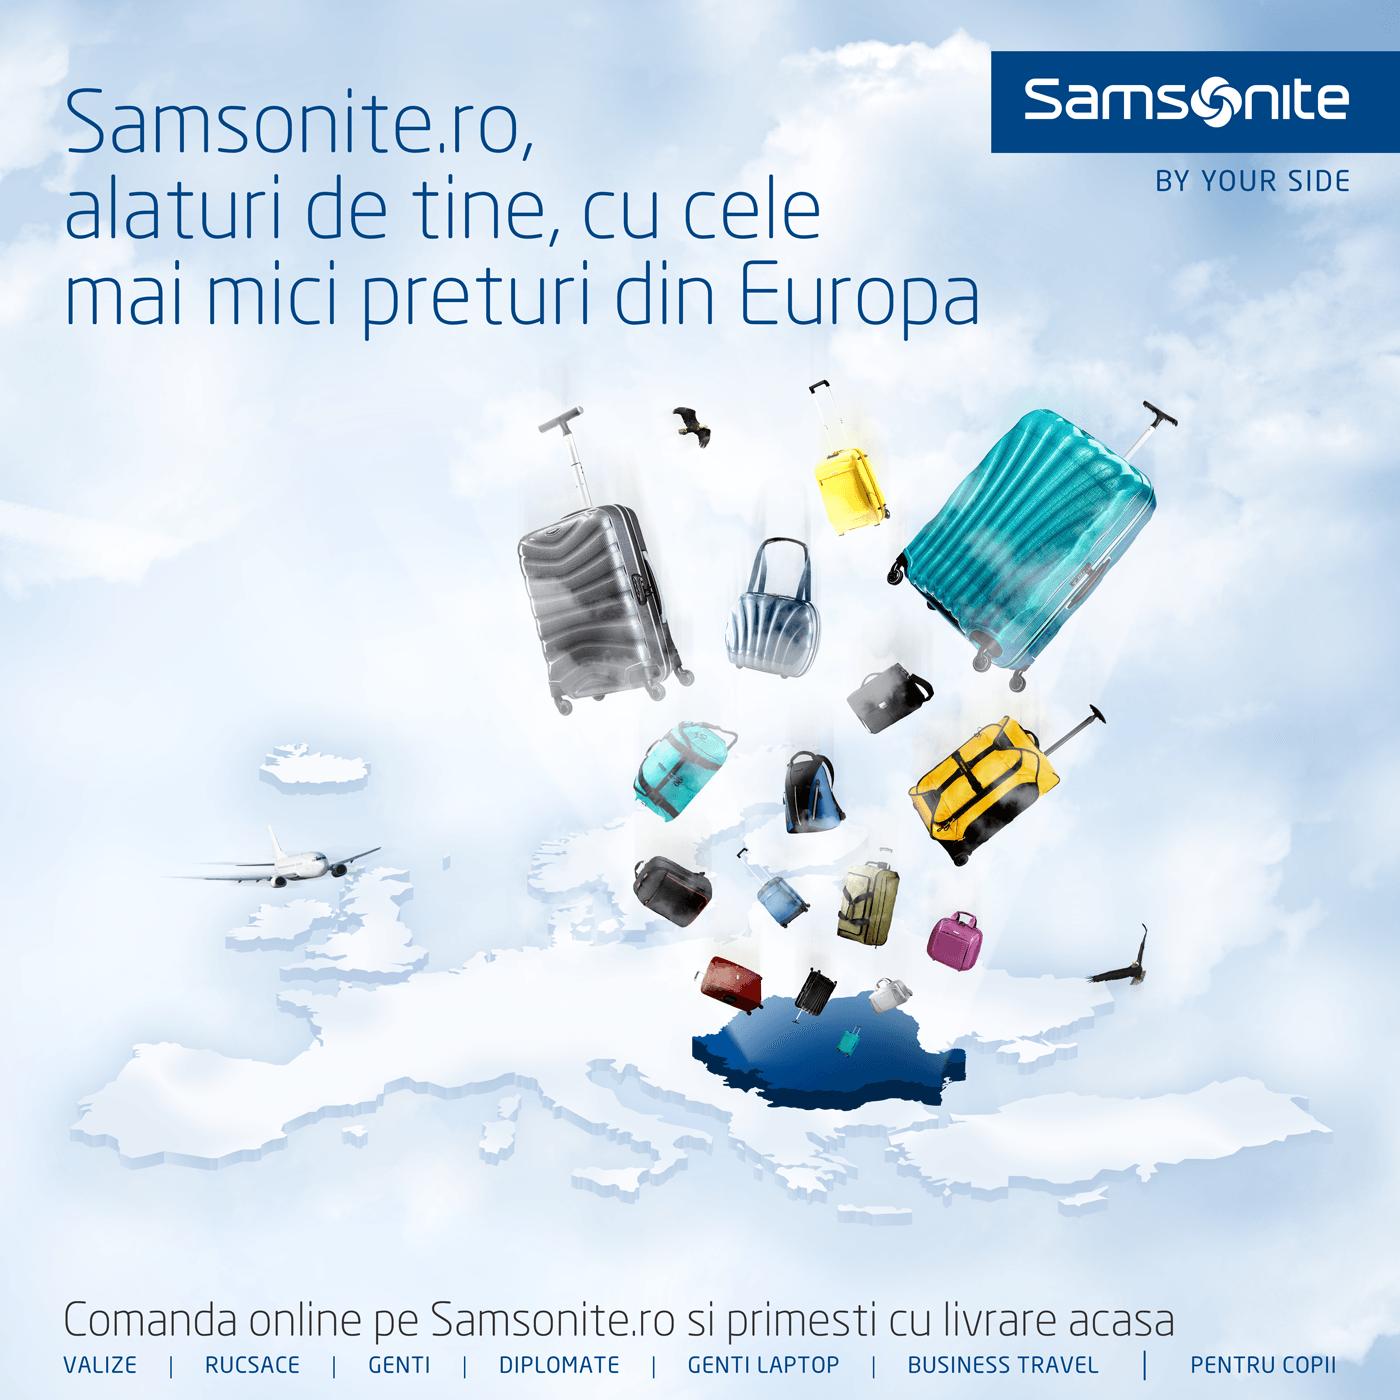 samsonite ads bags Travel shop sports